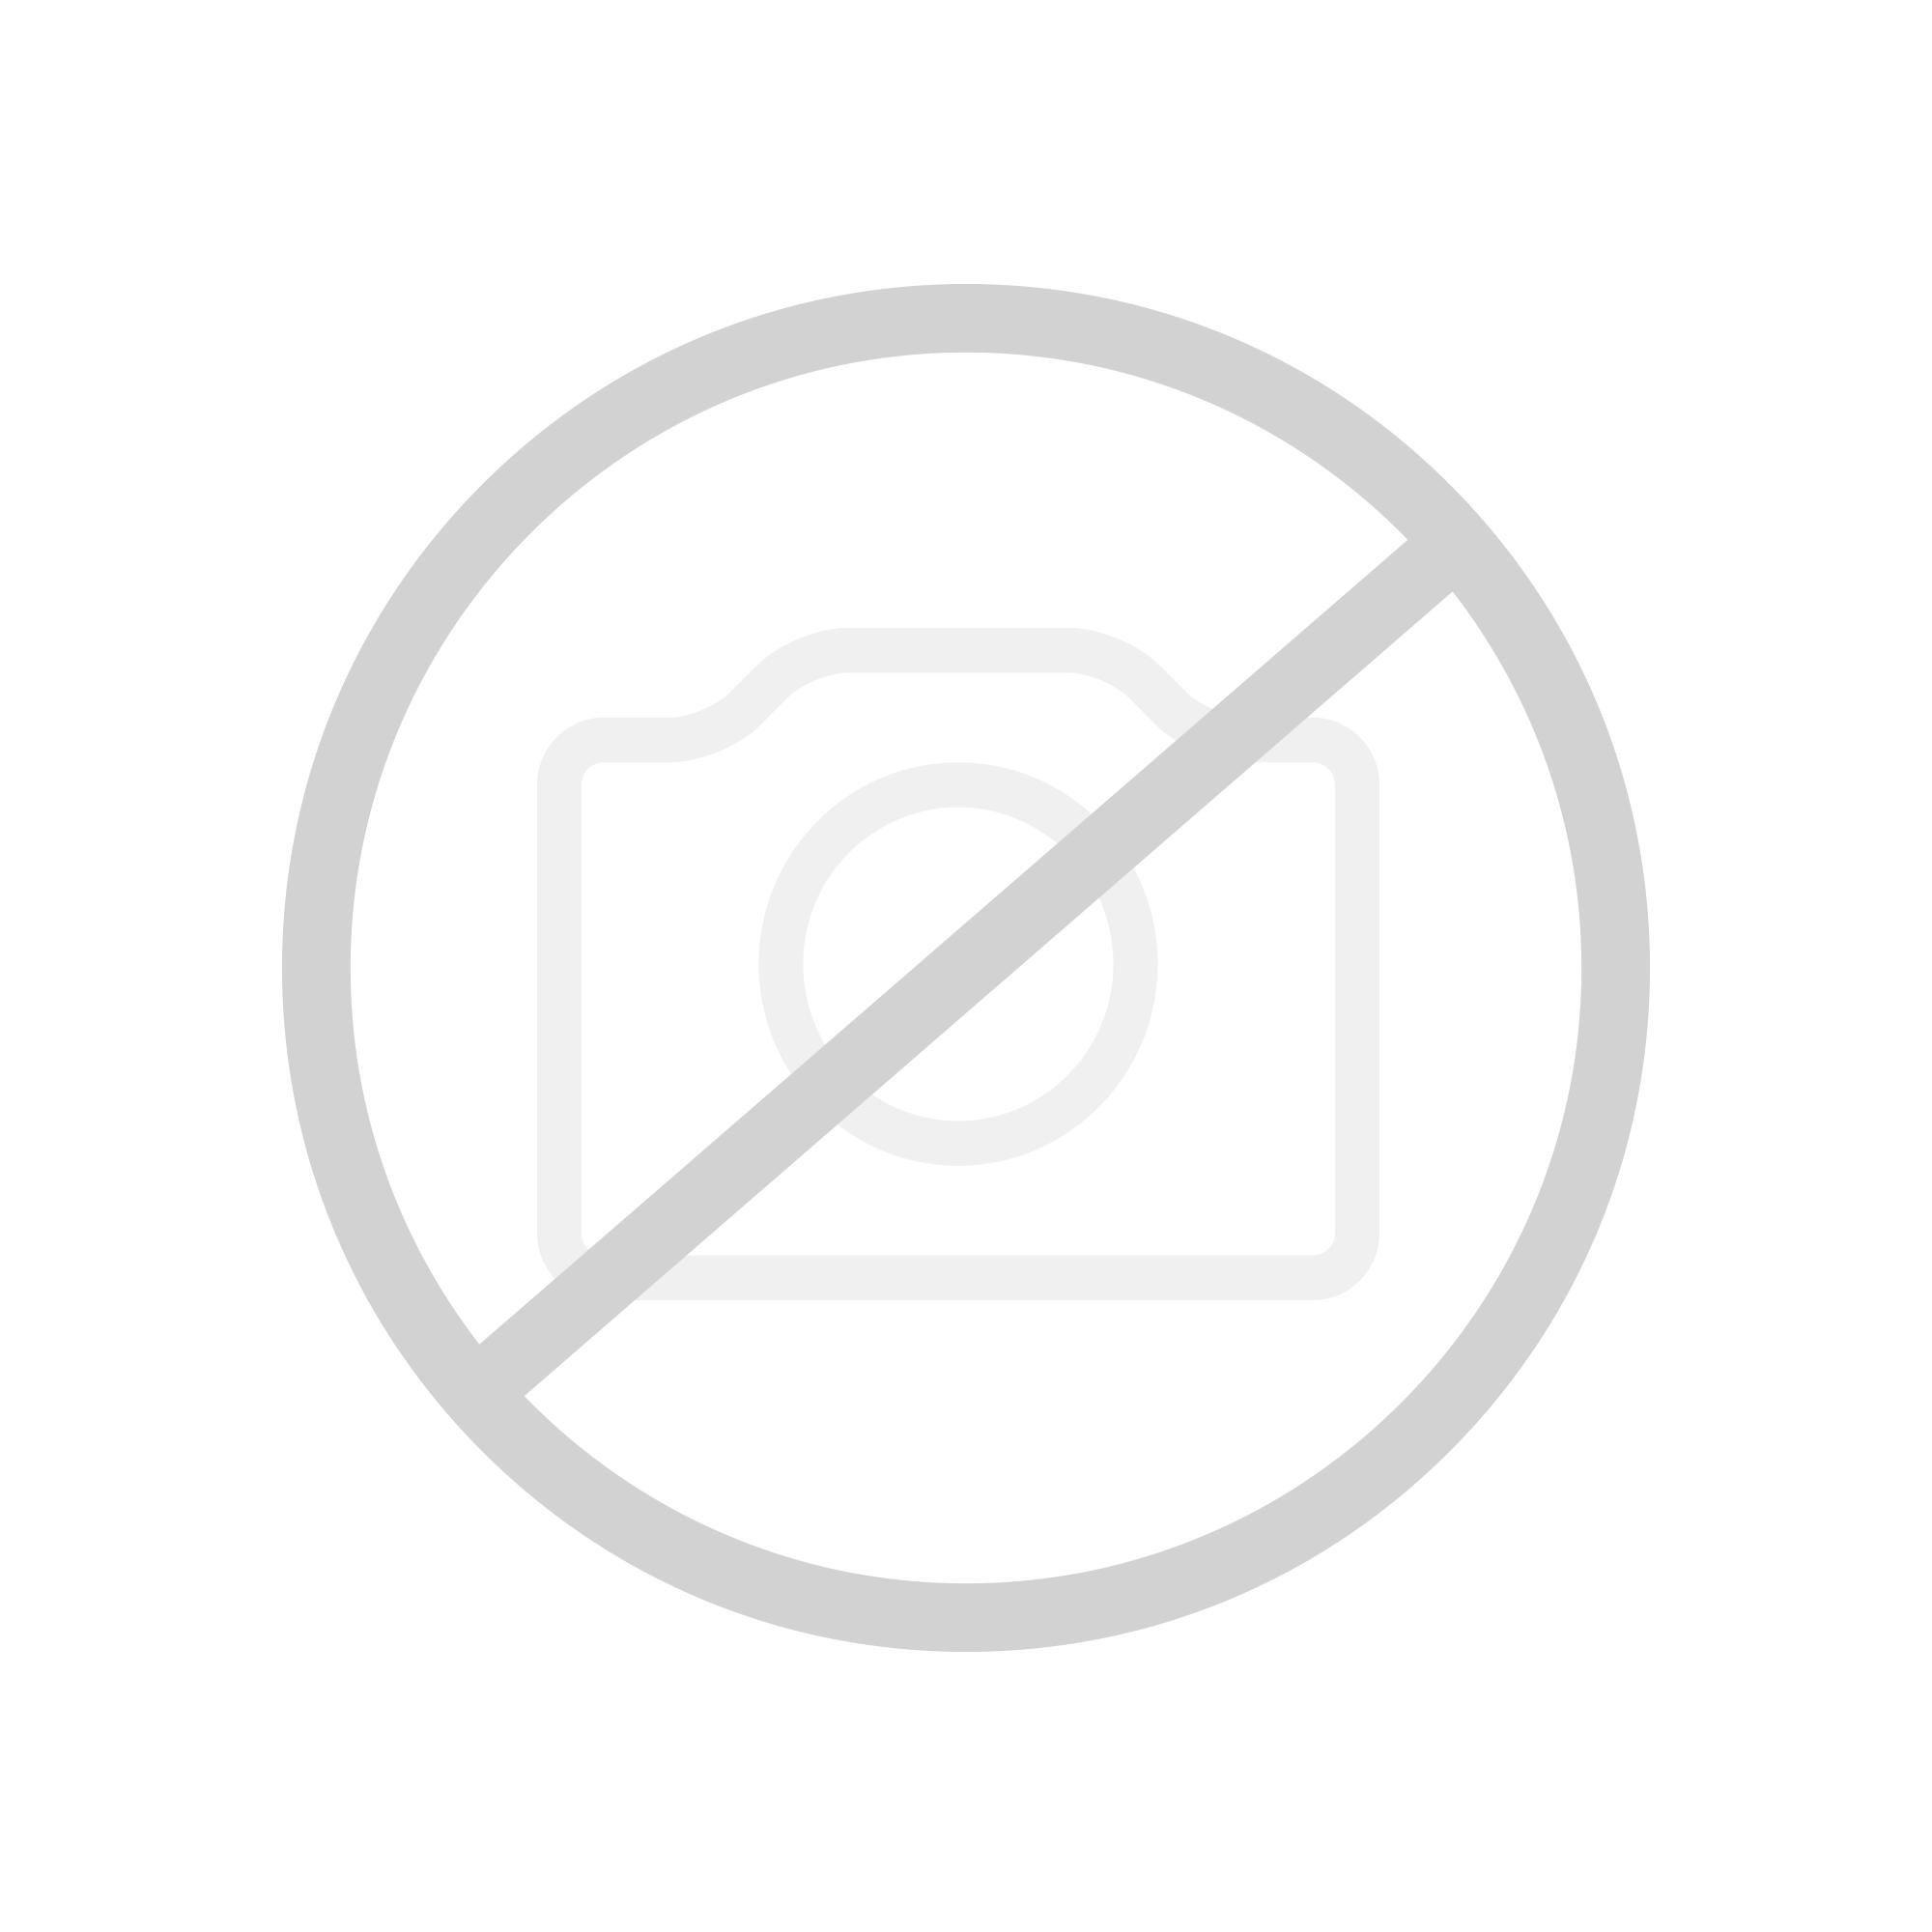 LCD 046LEDSEN Wandleuchte mit Bewegungsmelder